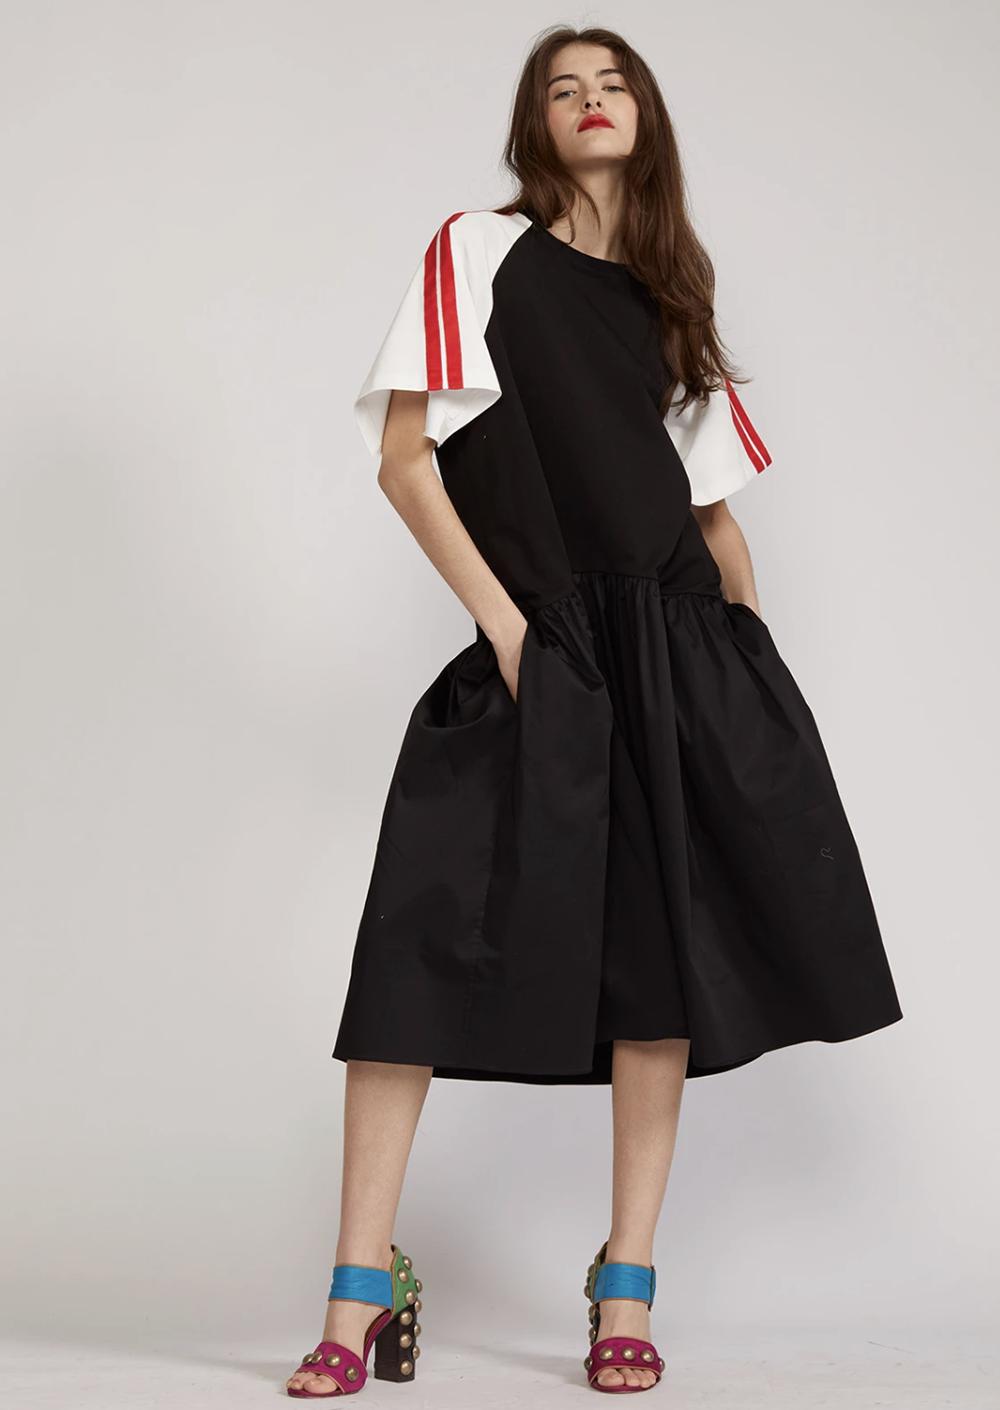 Cynthia Rowley Summer 2021 Styles I Striped Tee Shirt Dress #summerstyle